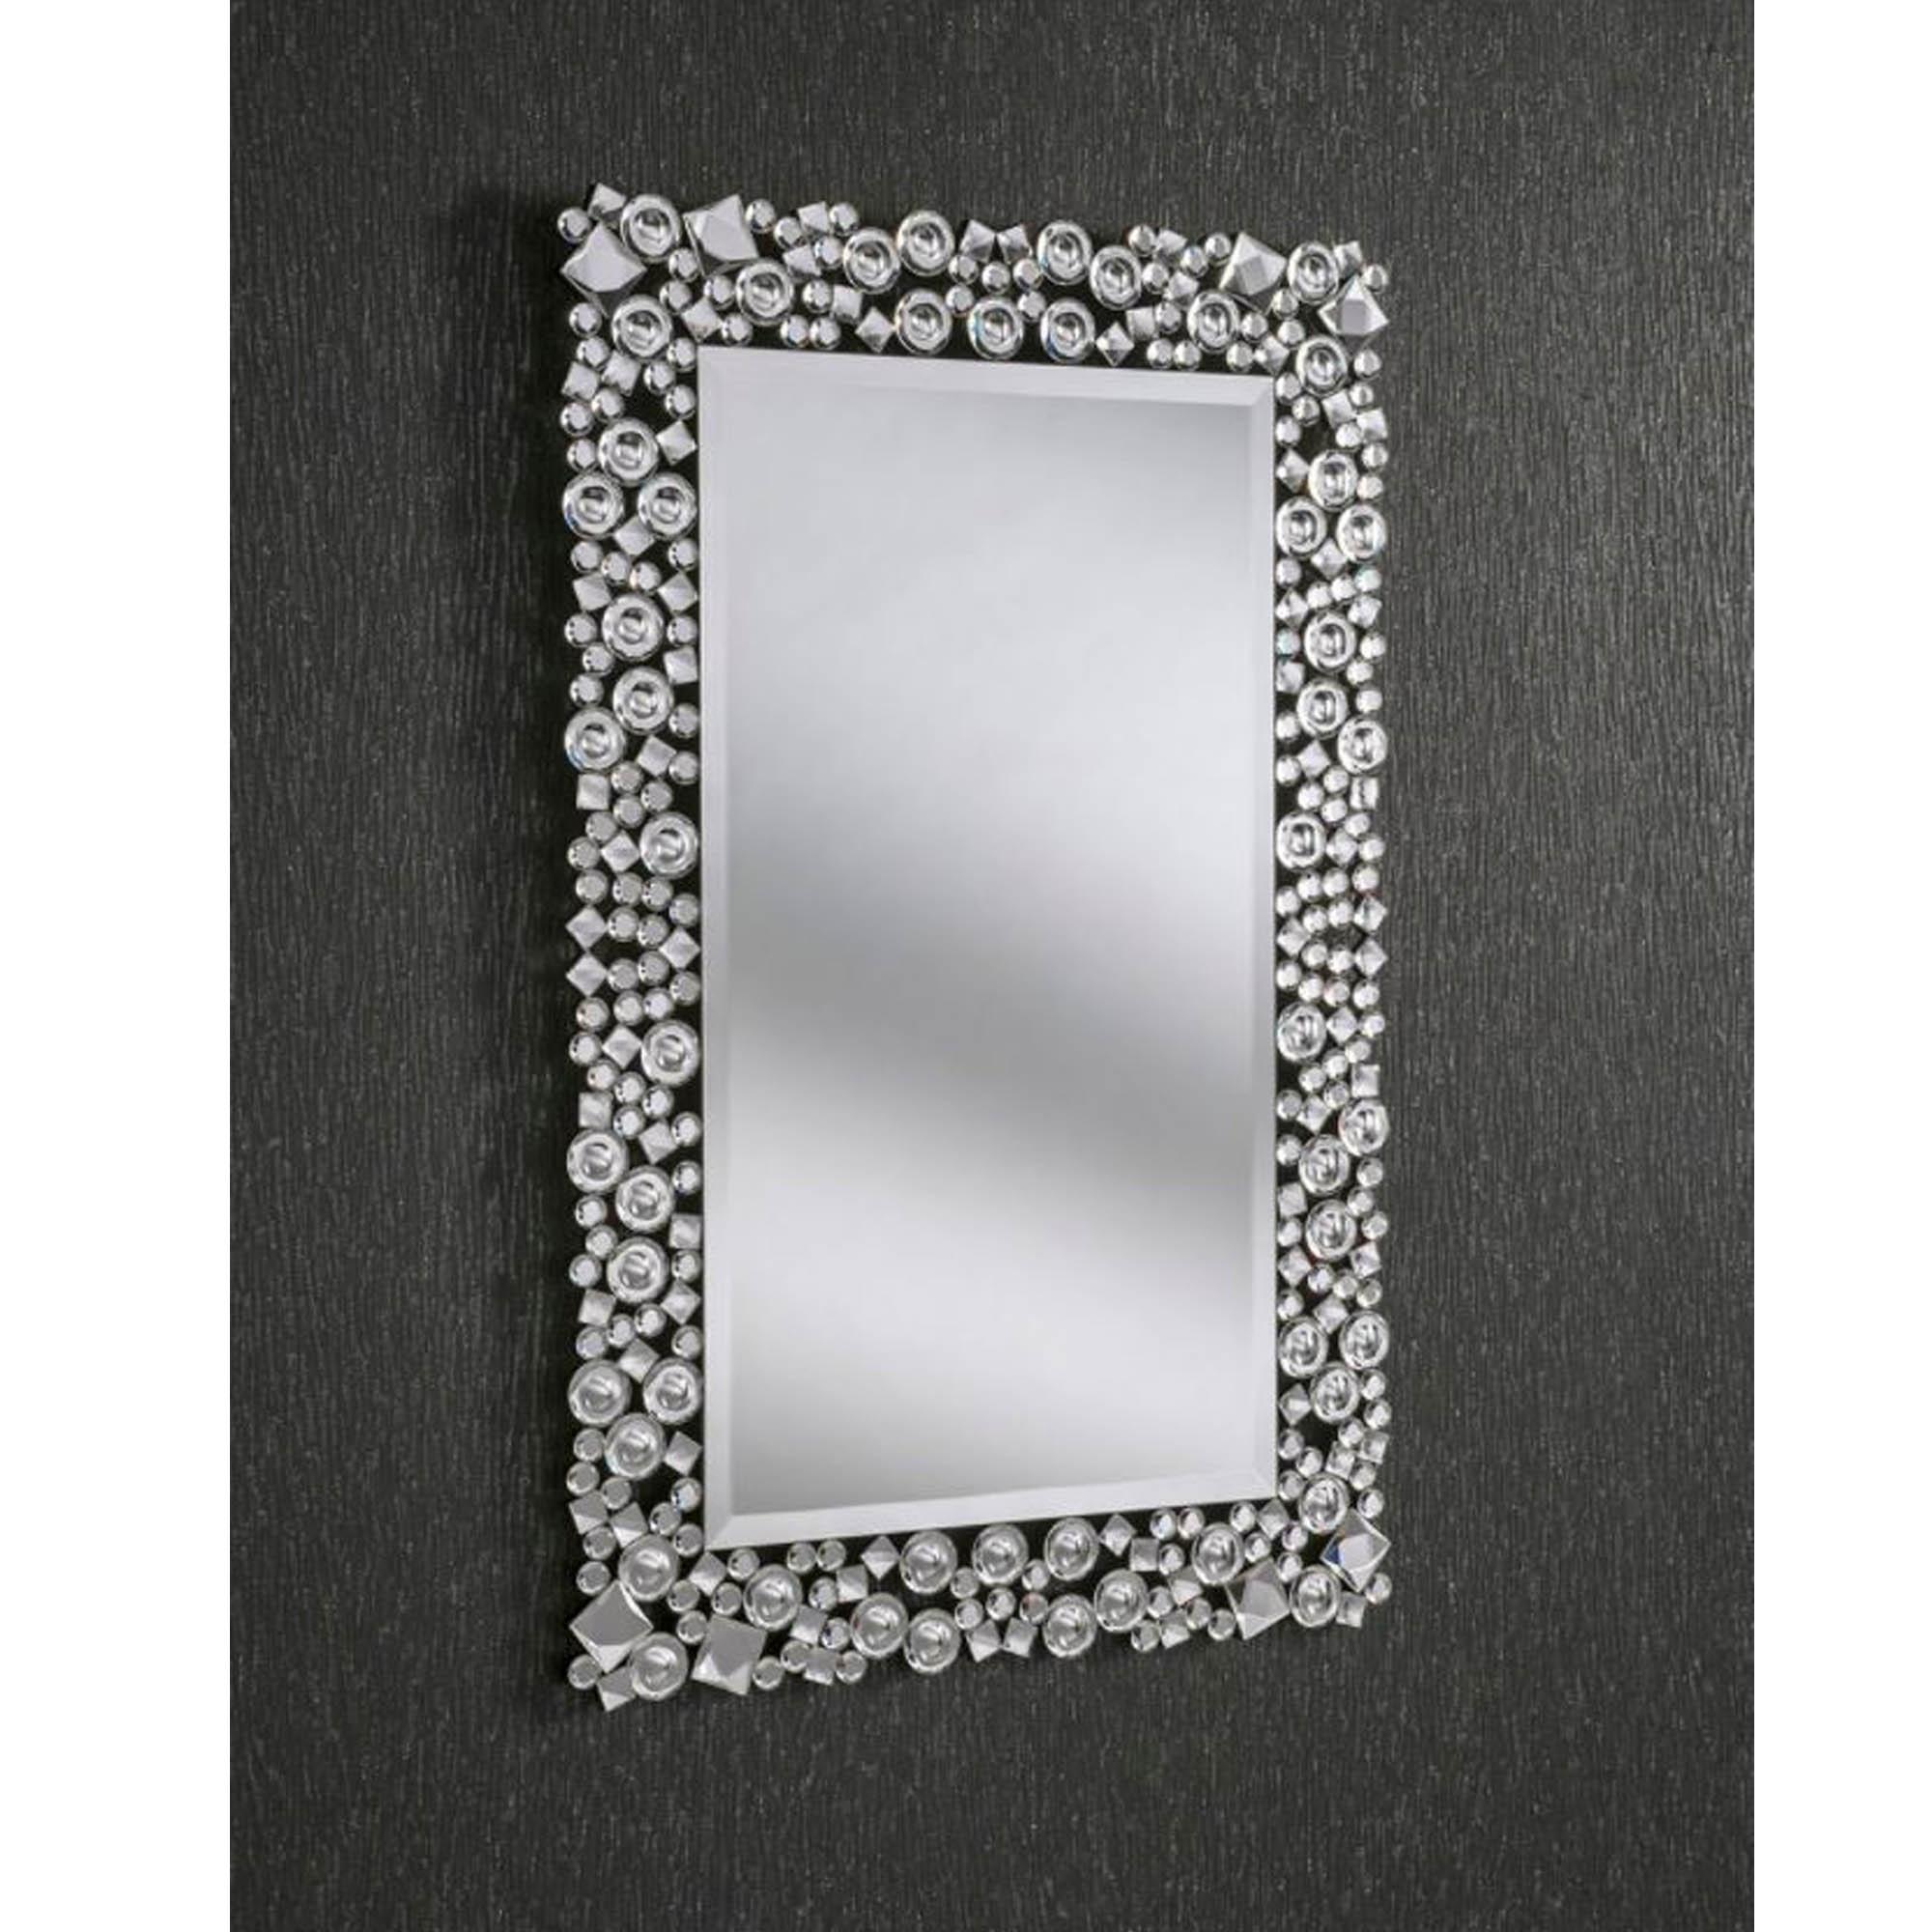 Decorative Crystal Rectangular Wall Mirror